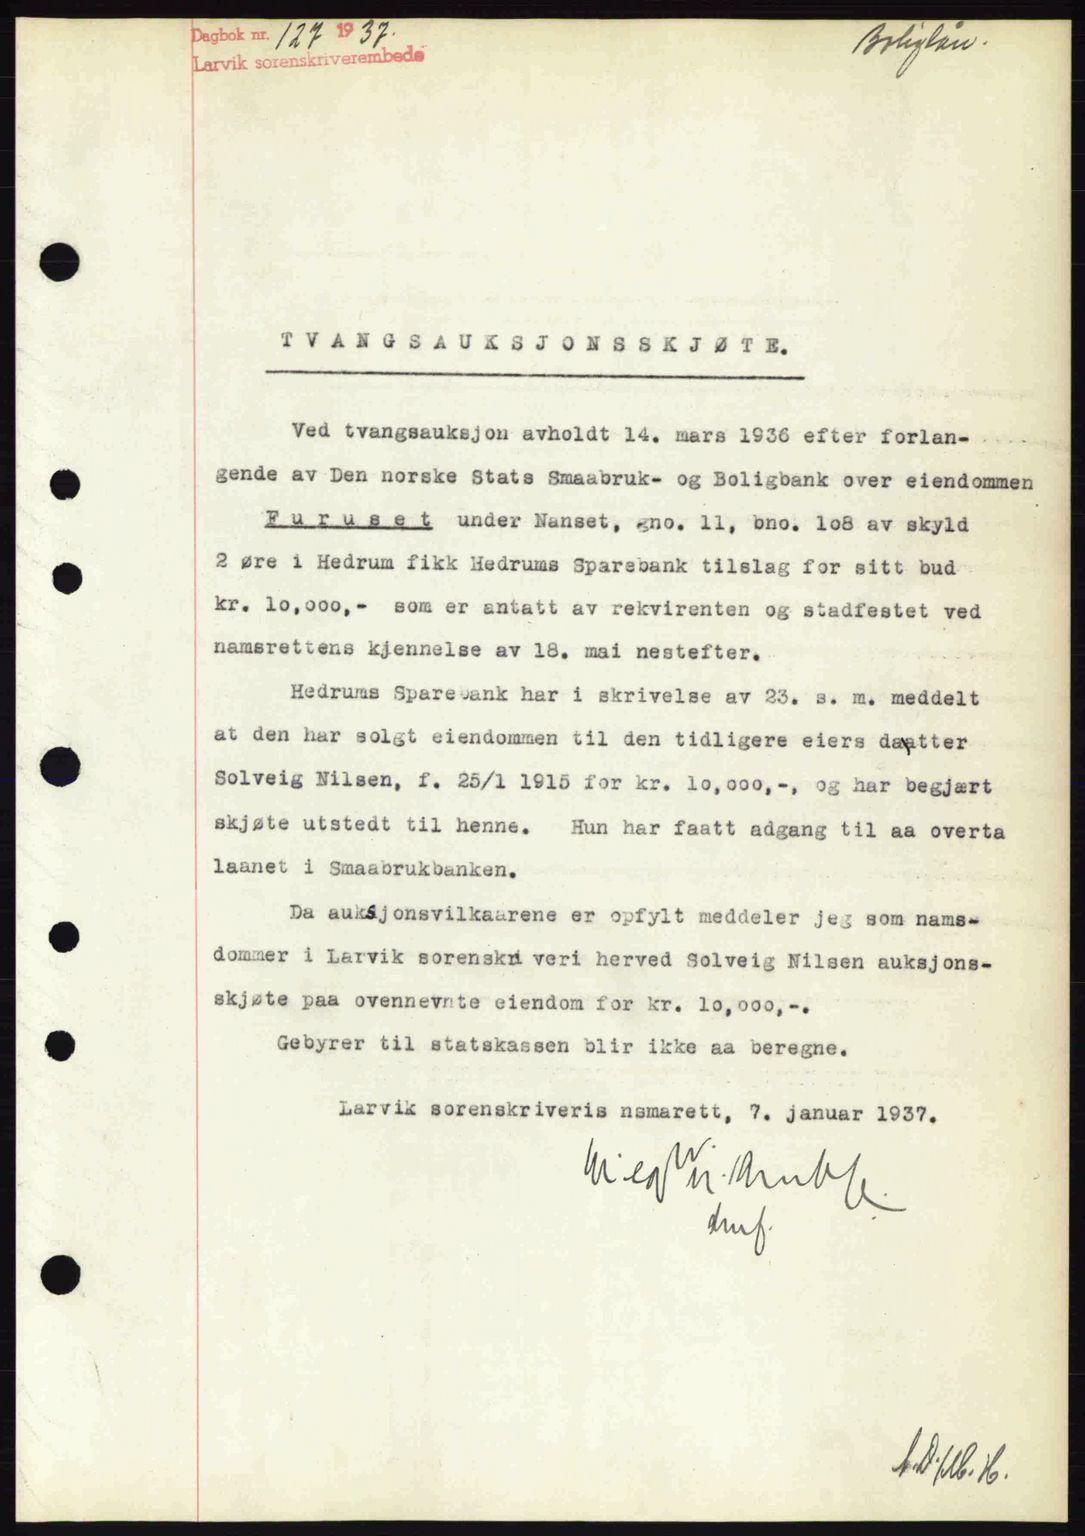 SAKO, Larvik sorenskriveri, G/Ga/Gab/L0067: Mortgage book no. A-1, 1936-1937, Diary no: : 127/1937